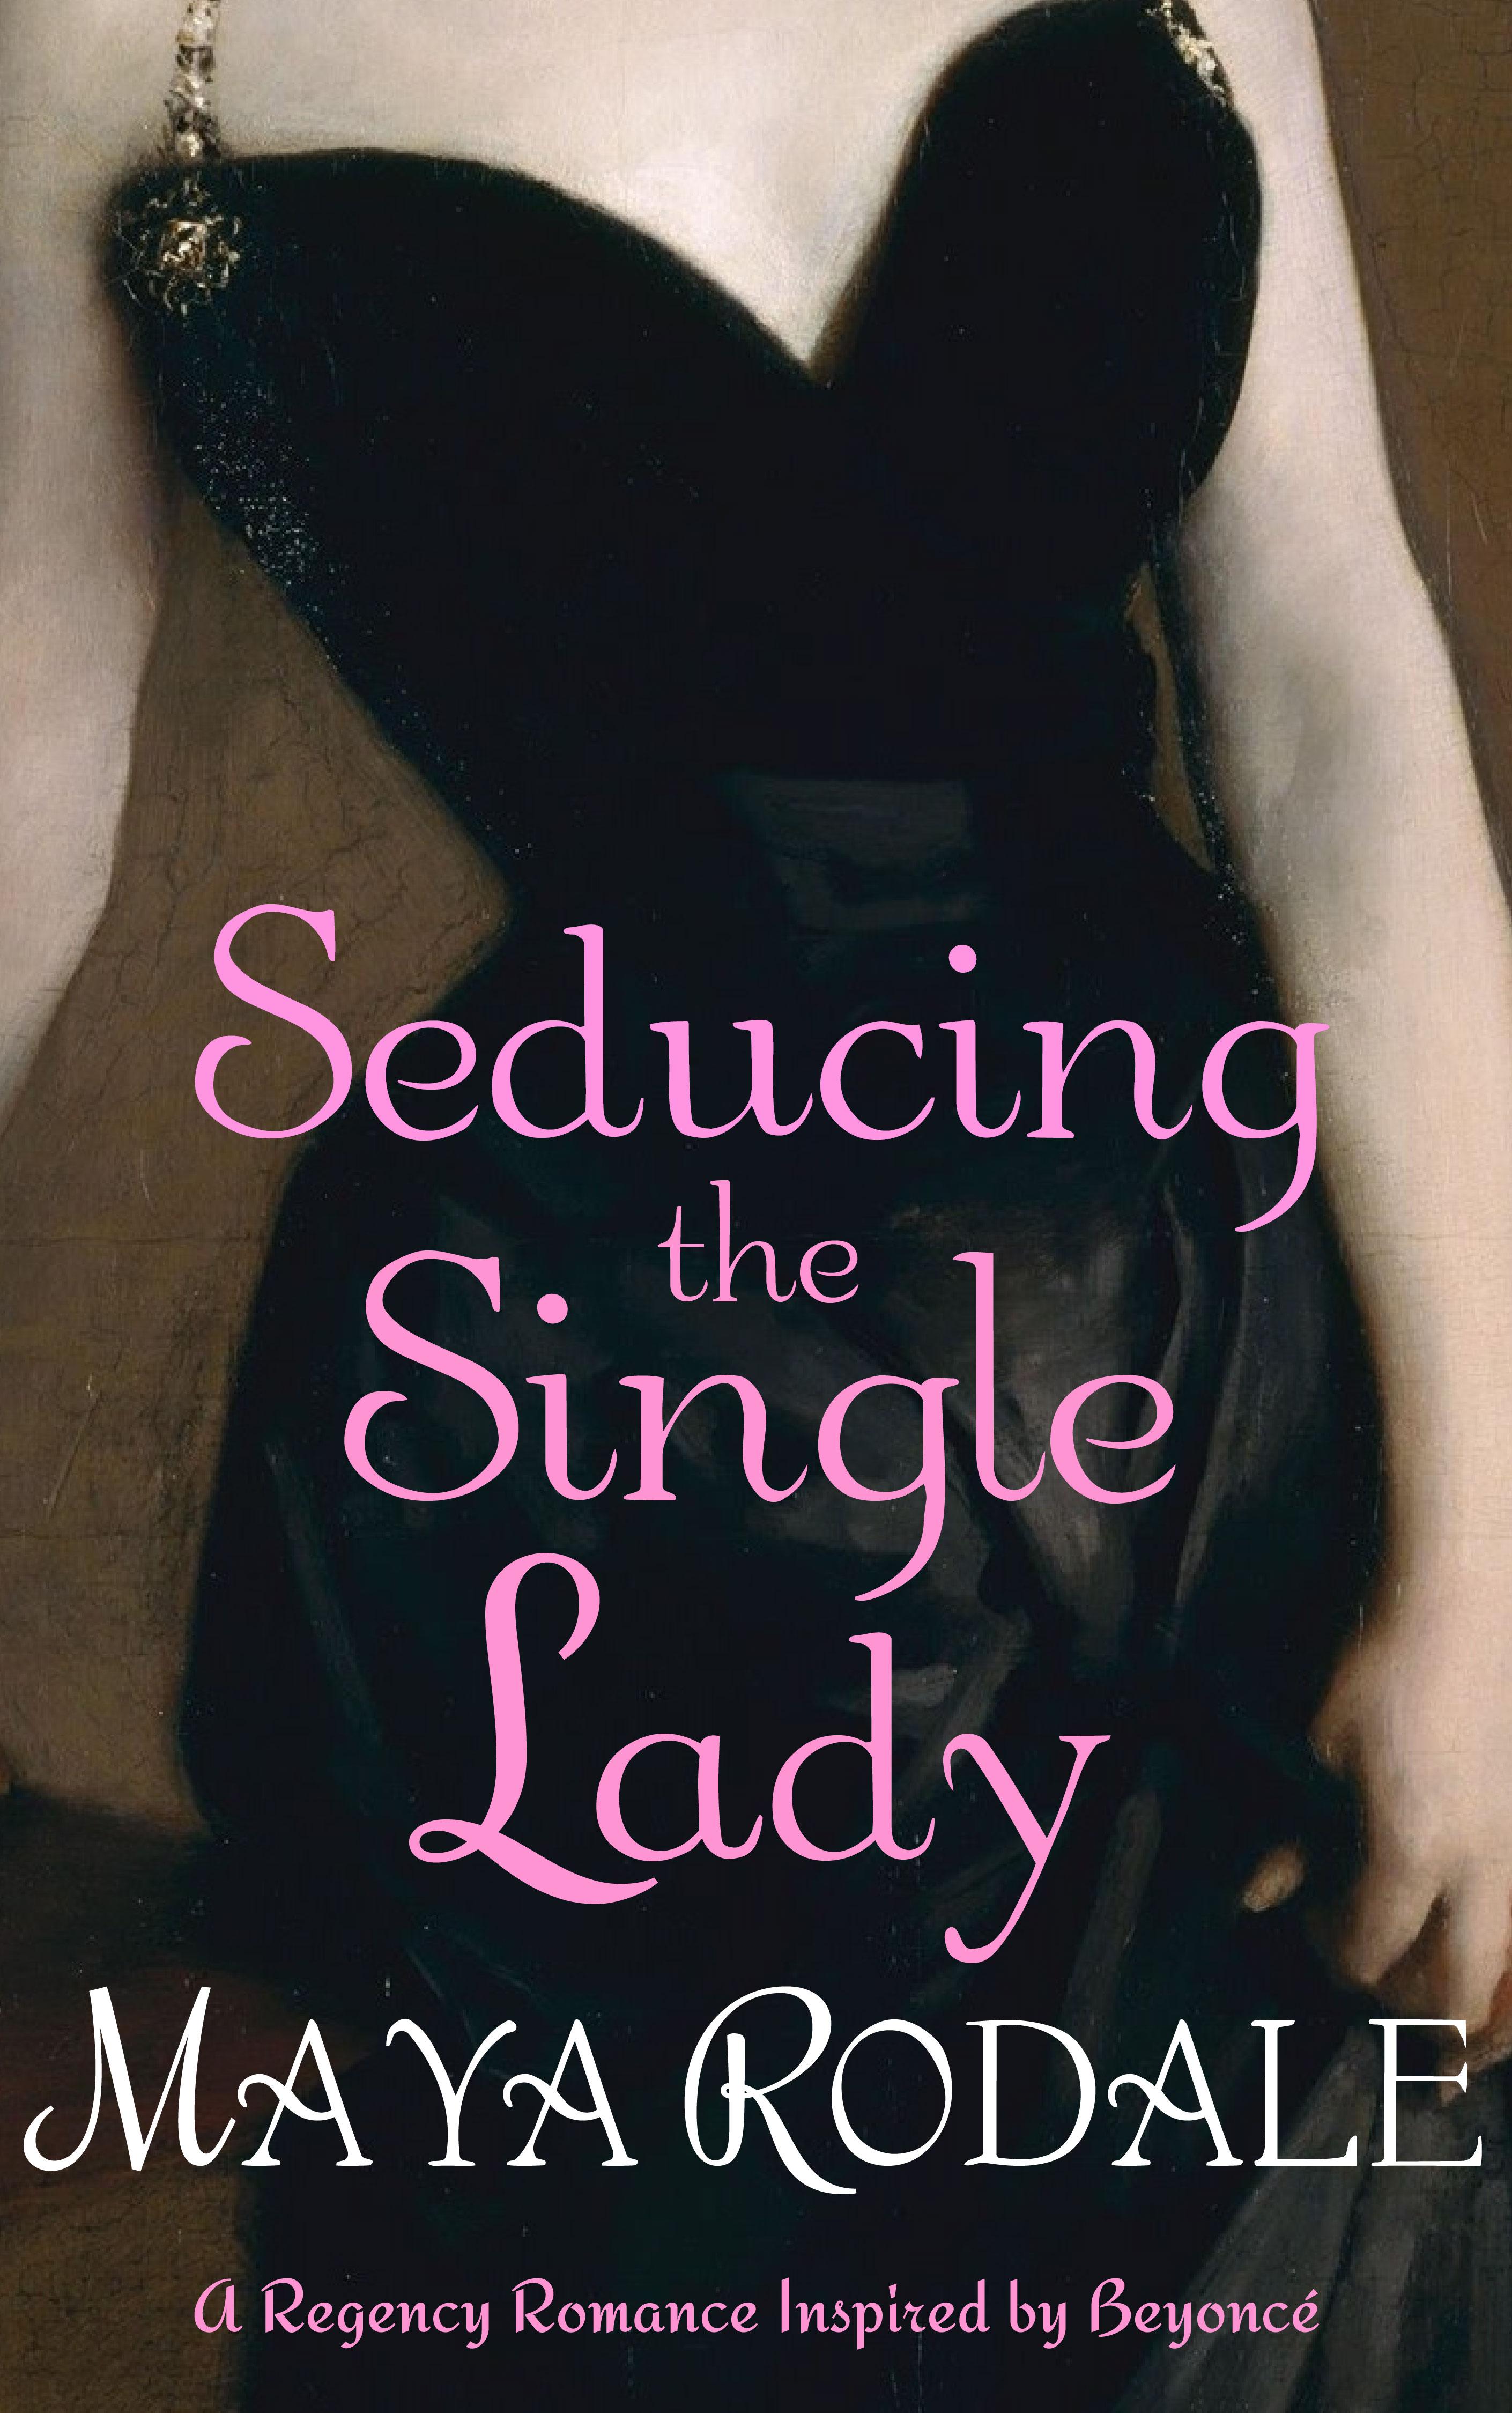 Maya Rodale - Seducing The Single Lady